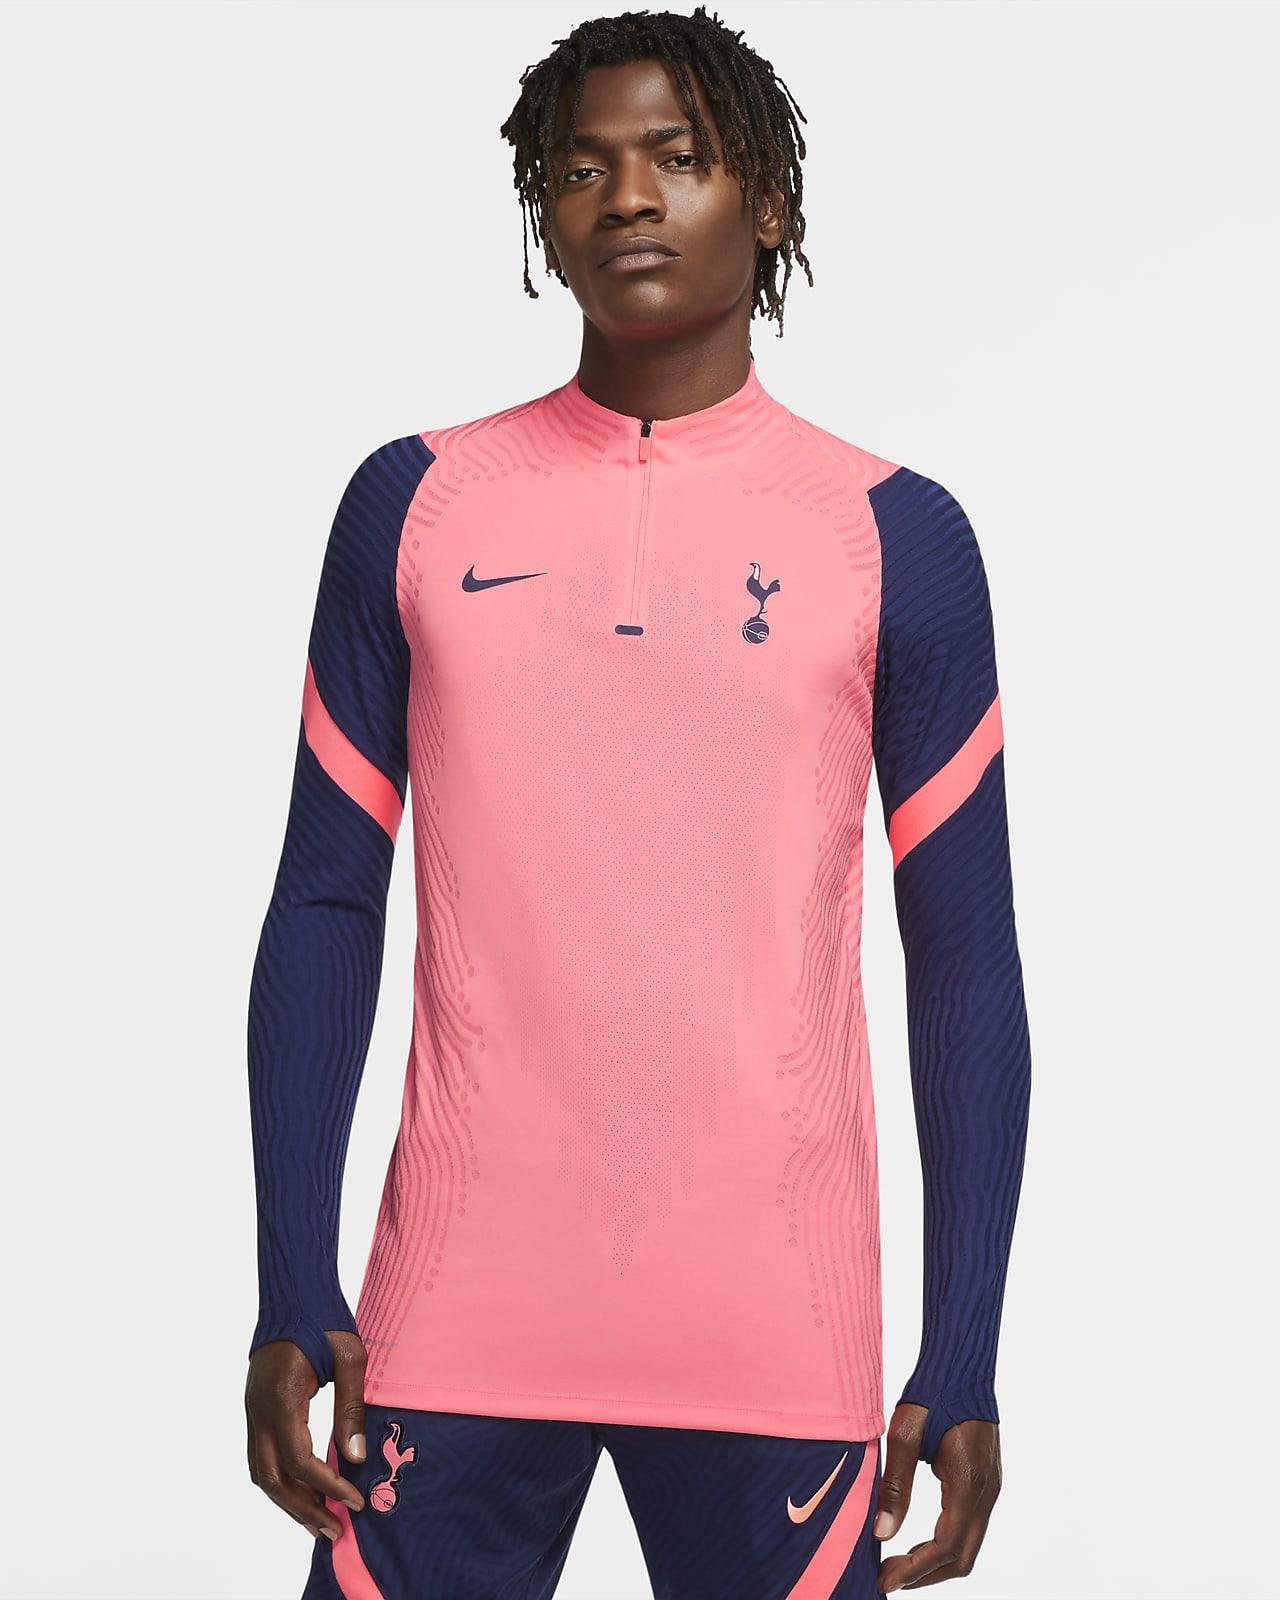 Tottenham Hotspur VaporKnit Strike Men's Football Drill Top